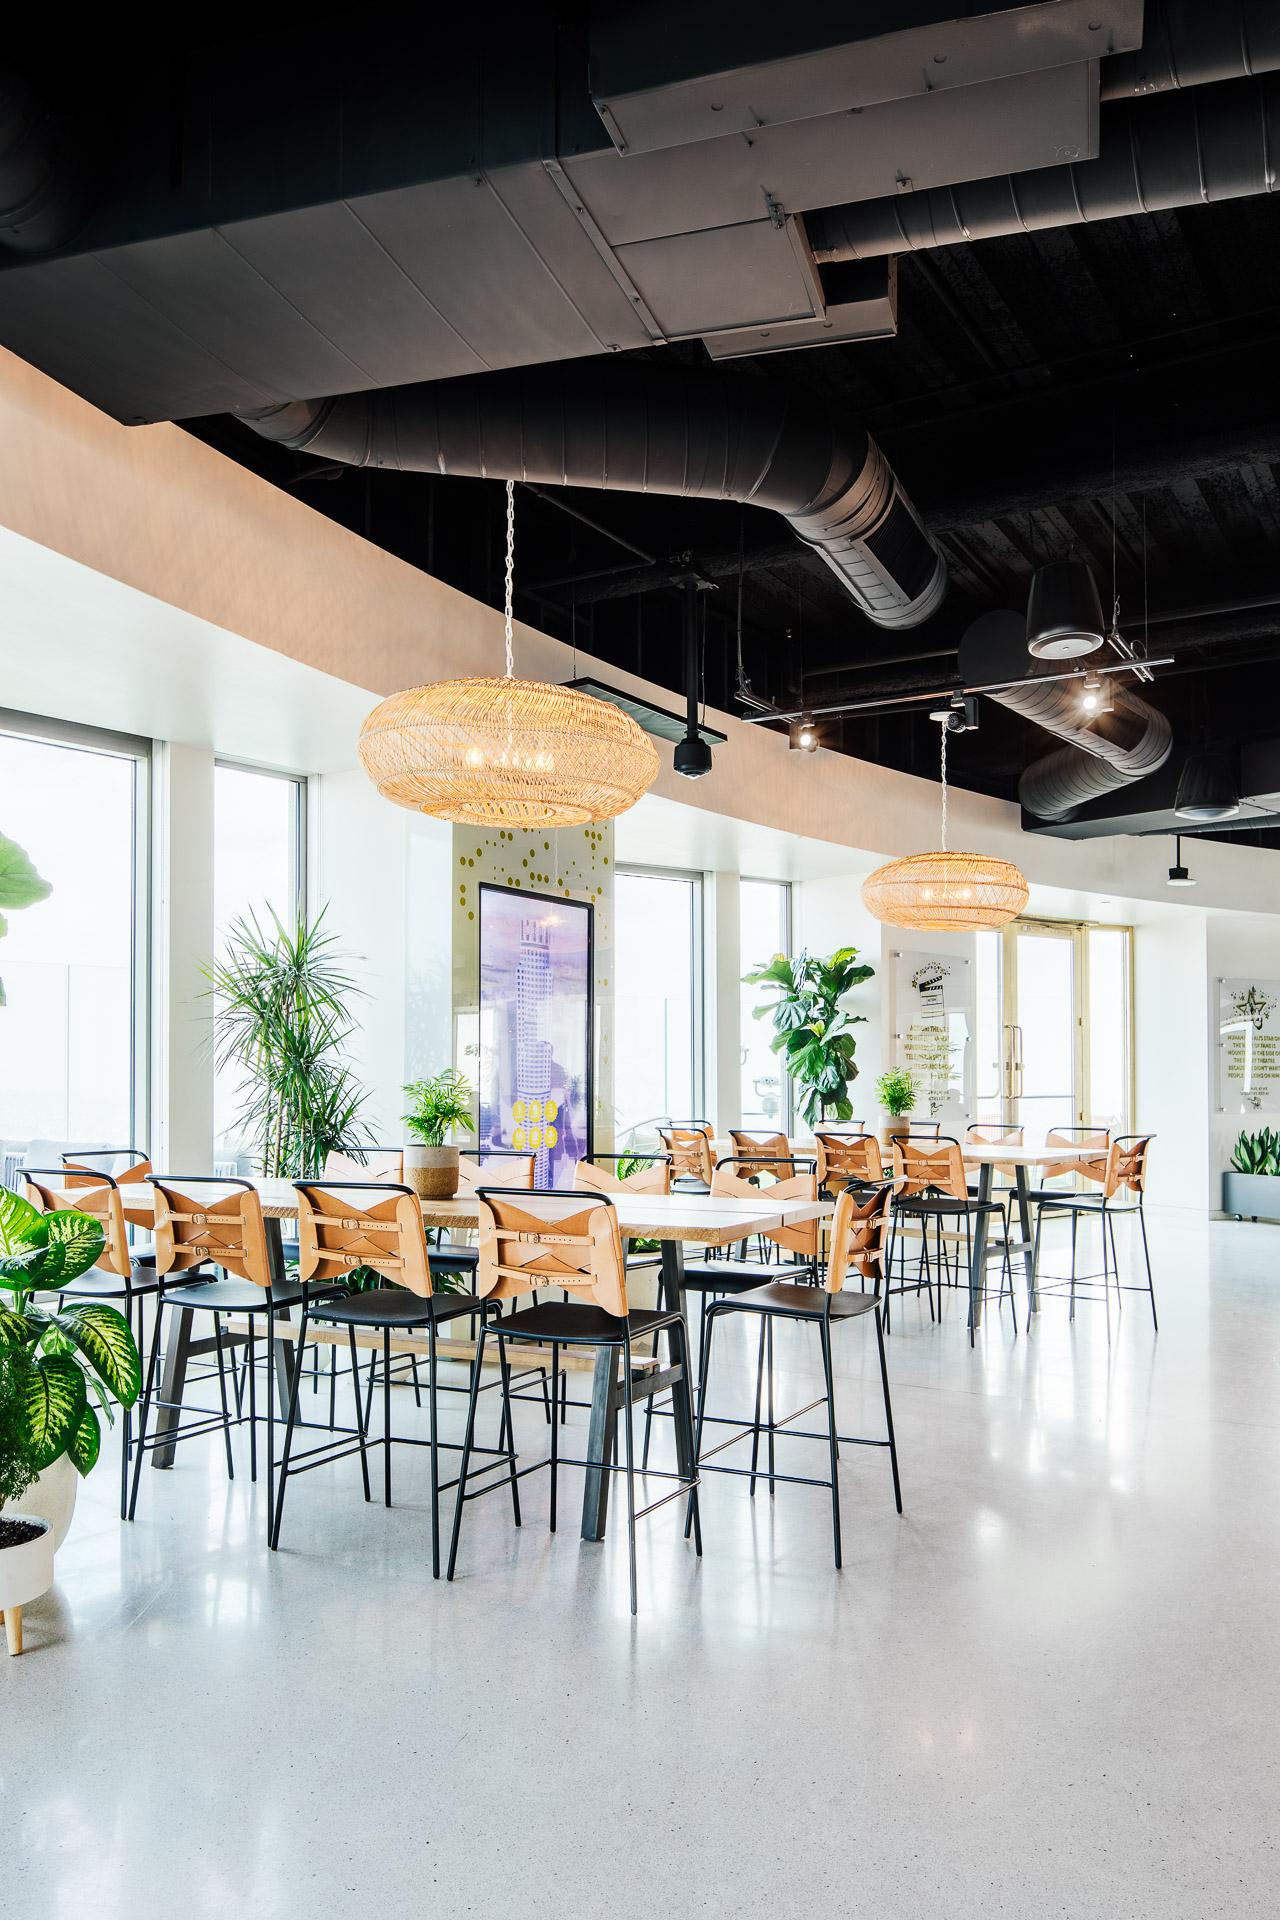 architectural-restaurant-interiors-photographer-los-angeles-oue-skyspace-dtla-10.jpg